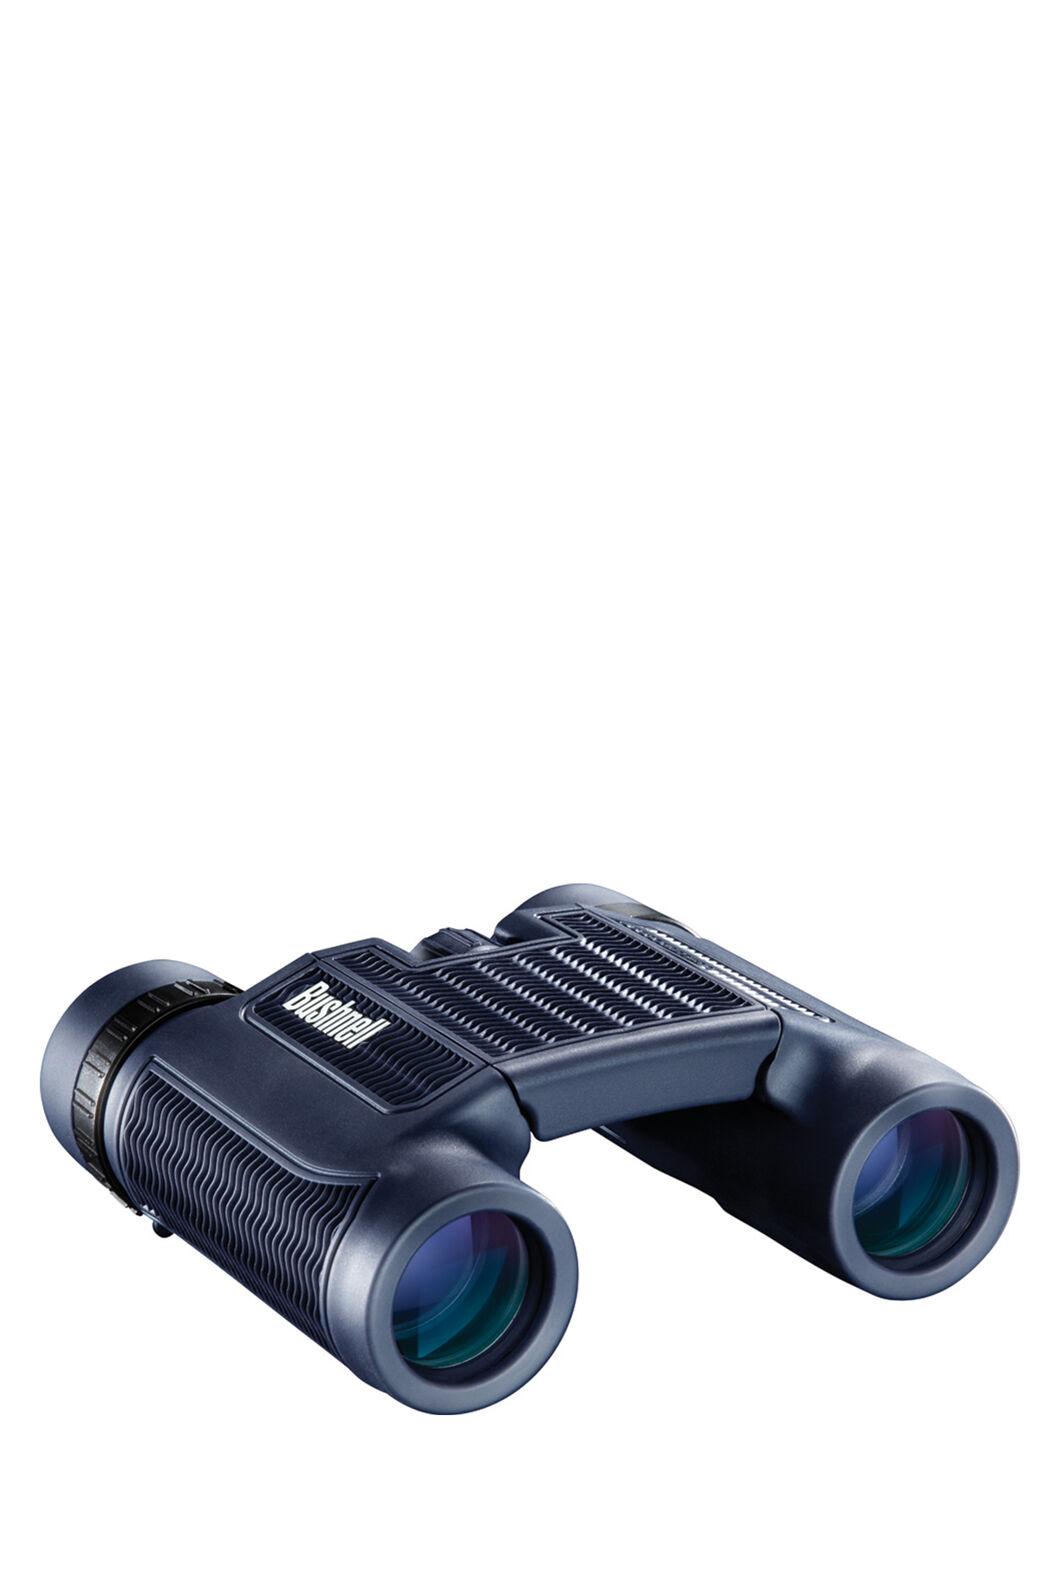 Bushnell x 25 H20 Binoculars, None, hi-res